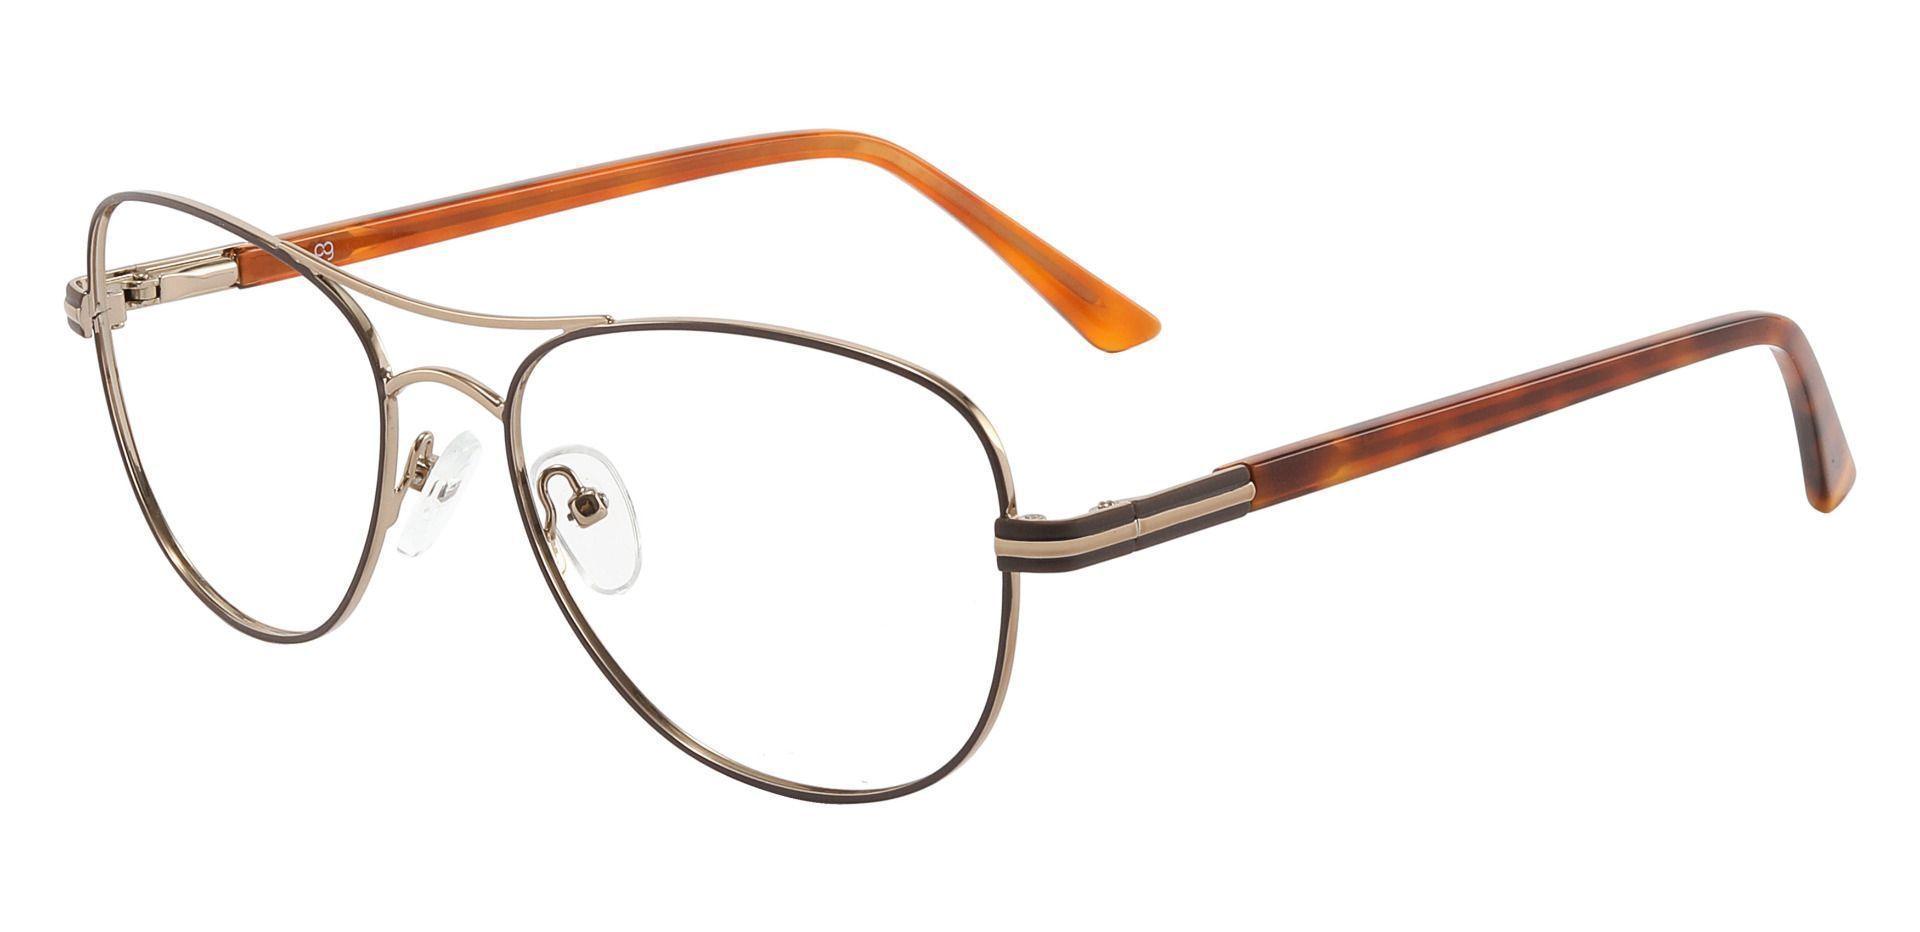 Reeves Aviator Prescription Glasses - Brown